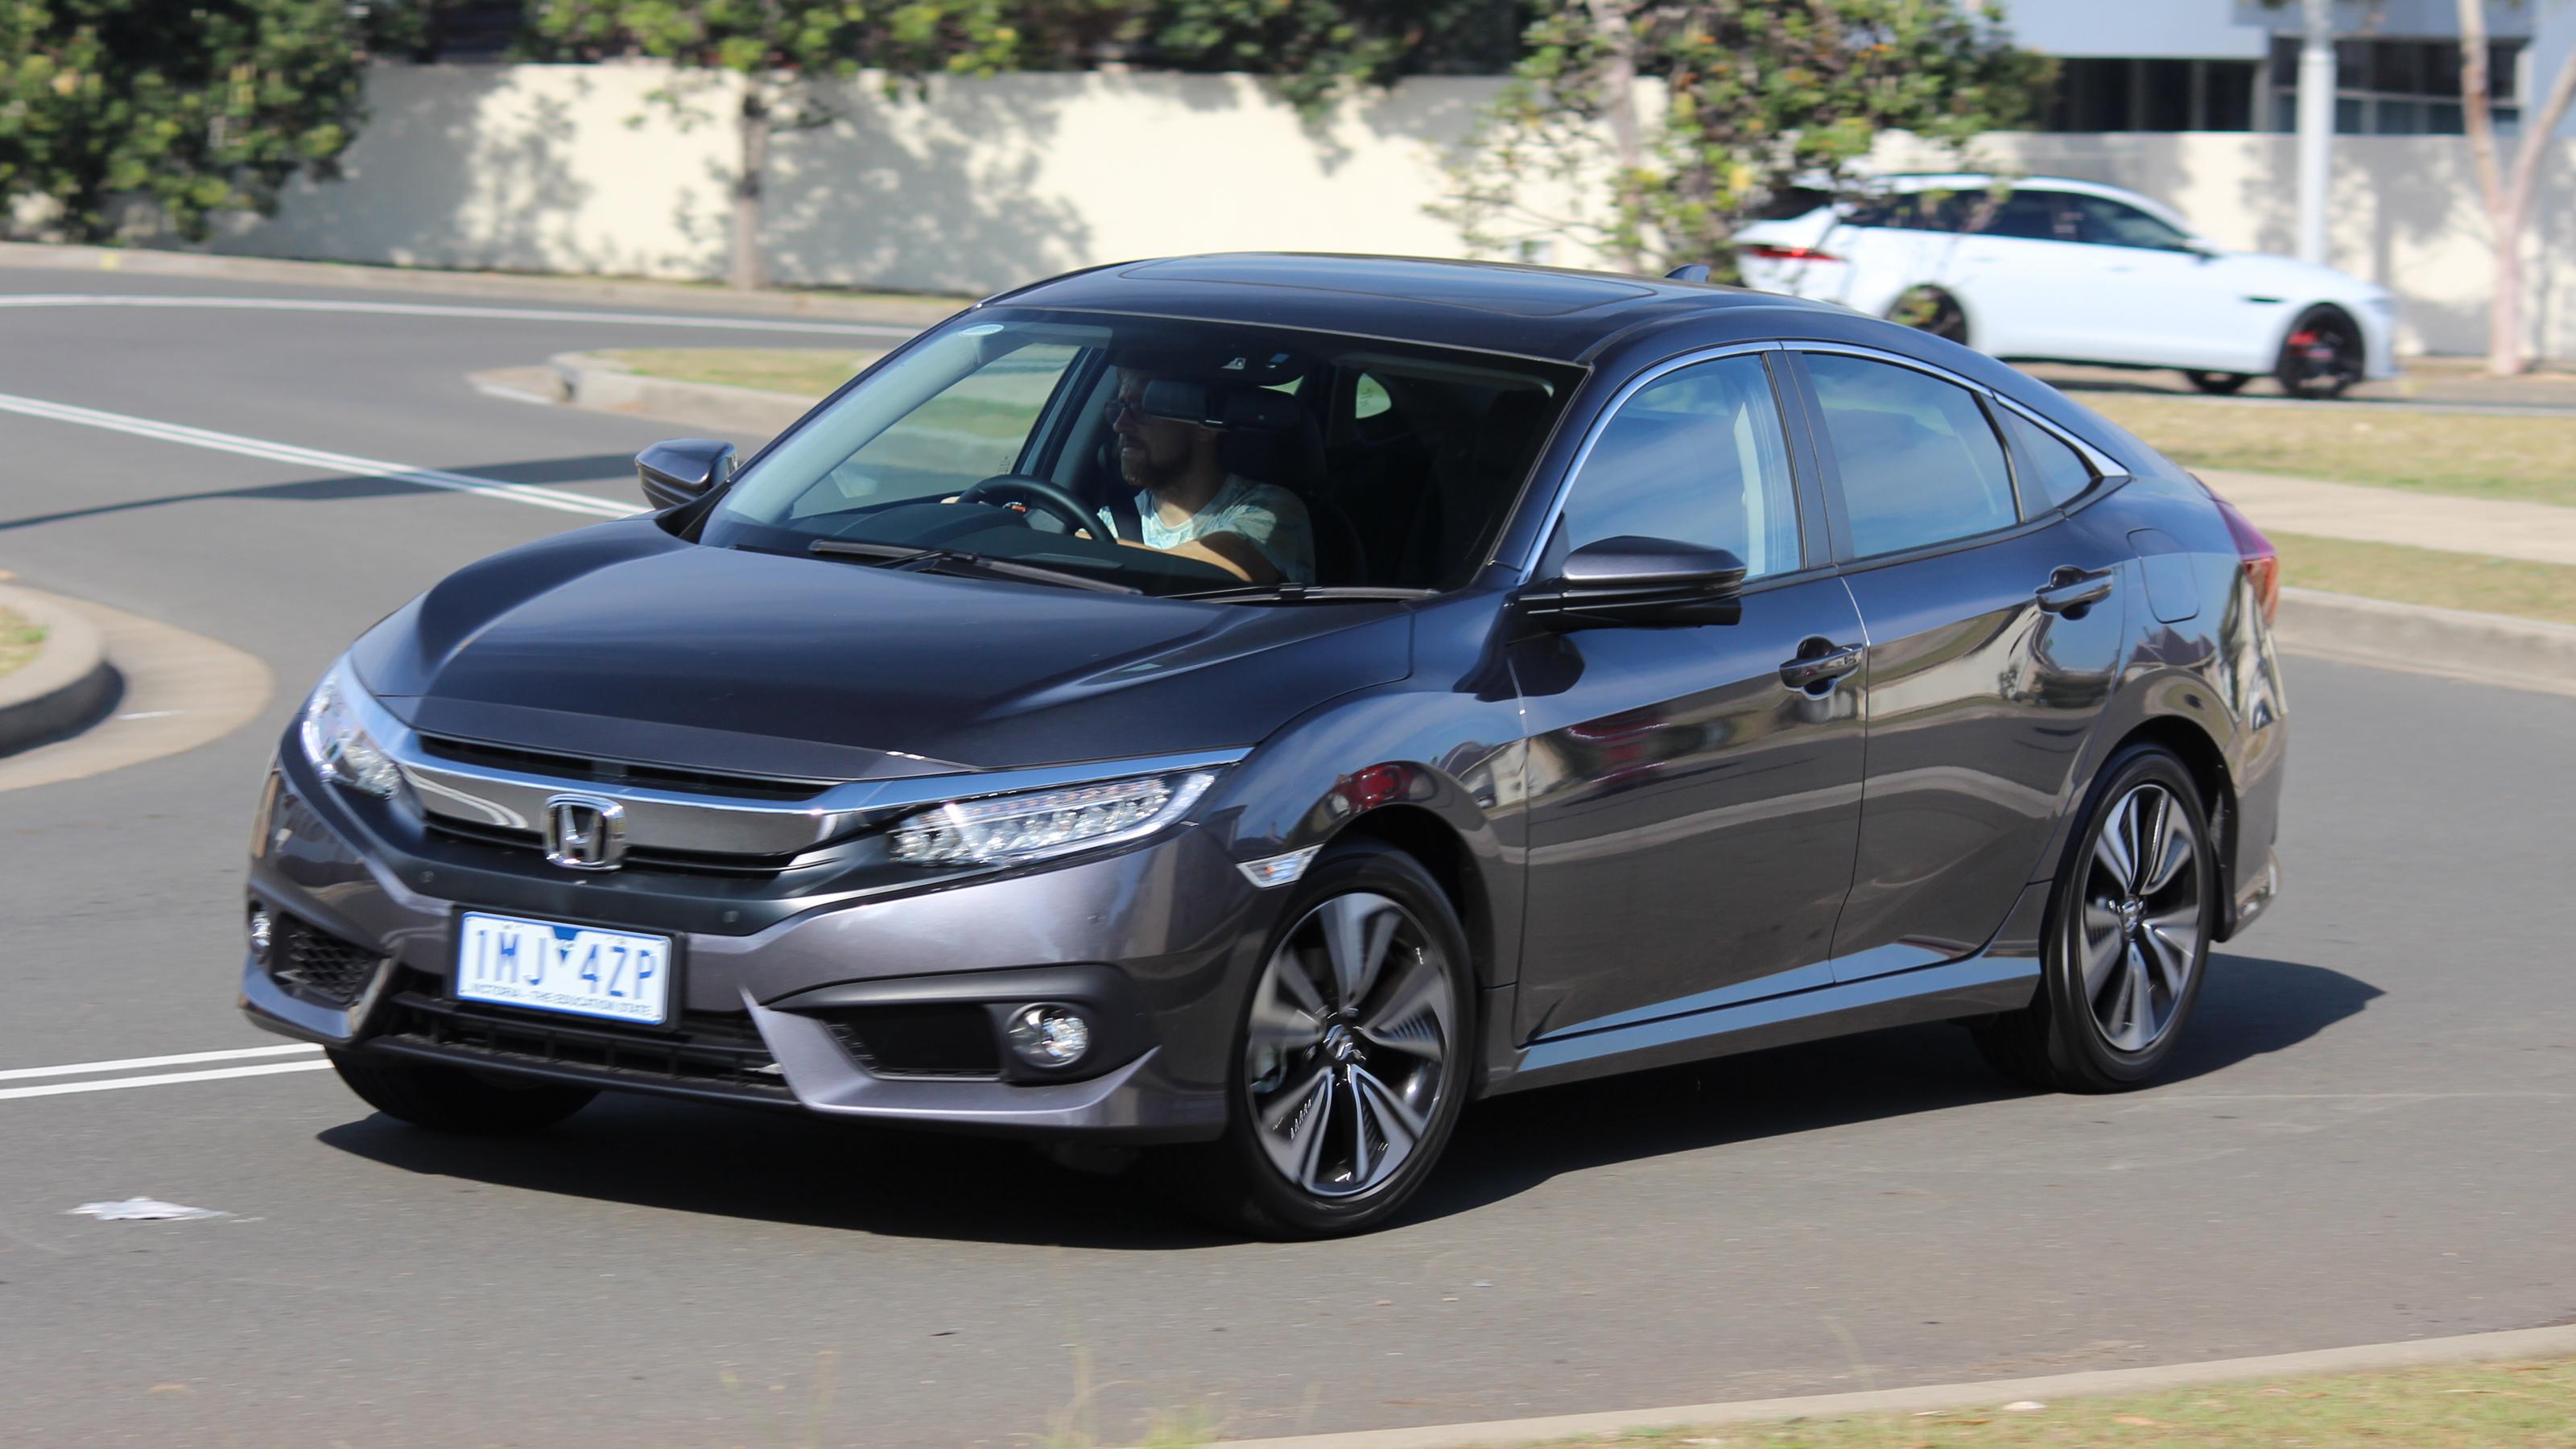 2018 Honda Civic VTi-LX sedan new car review